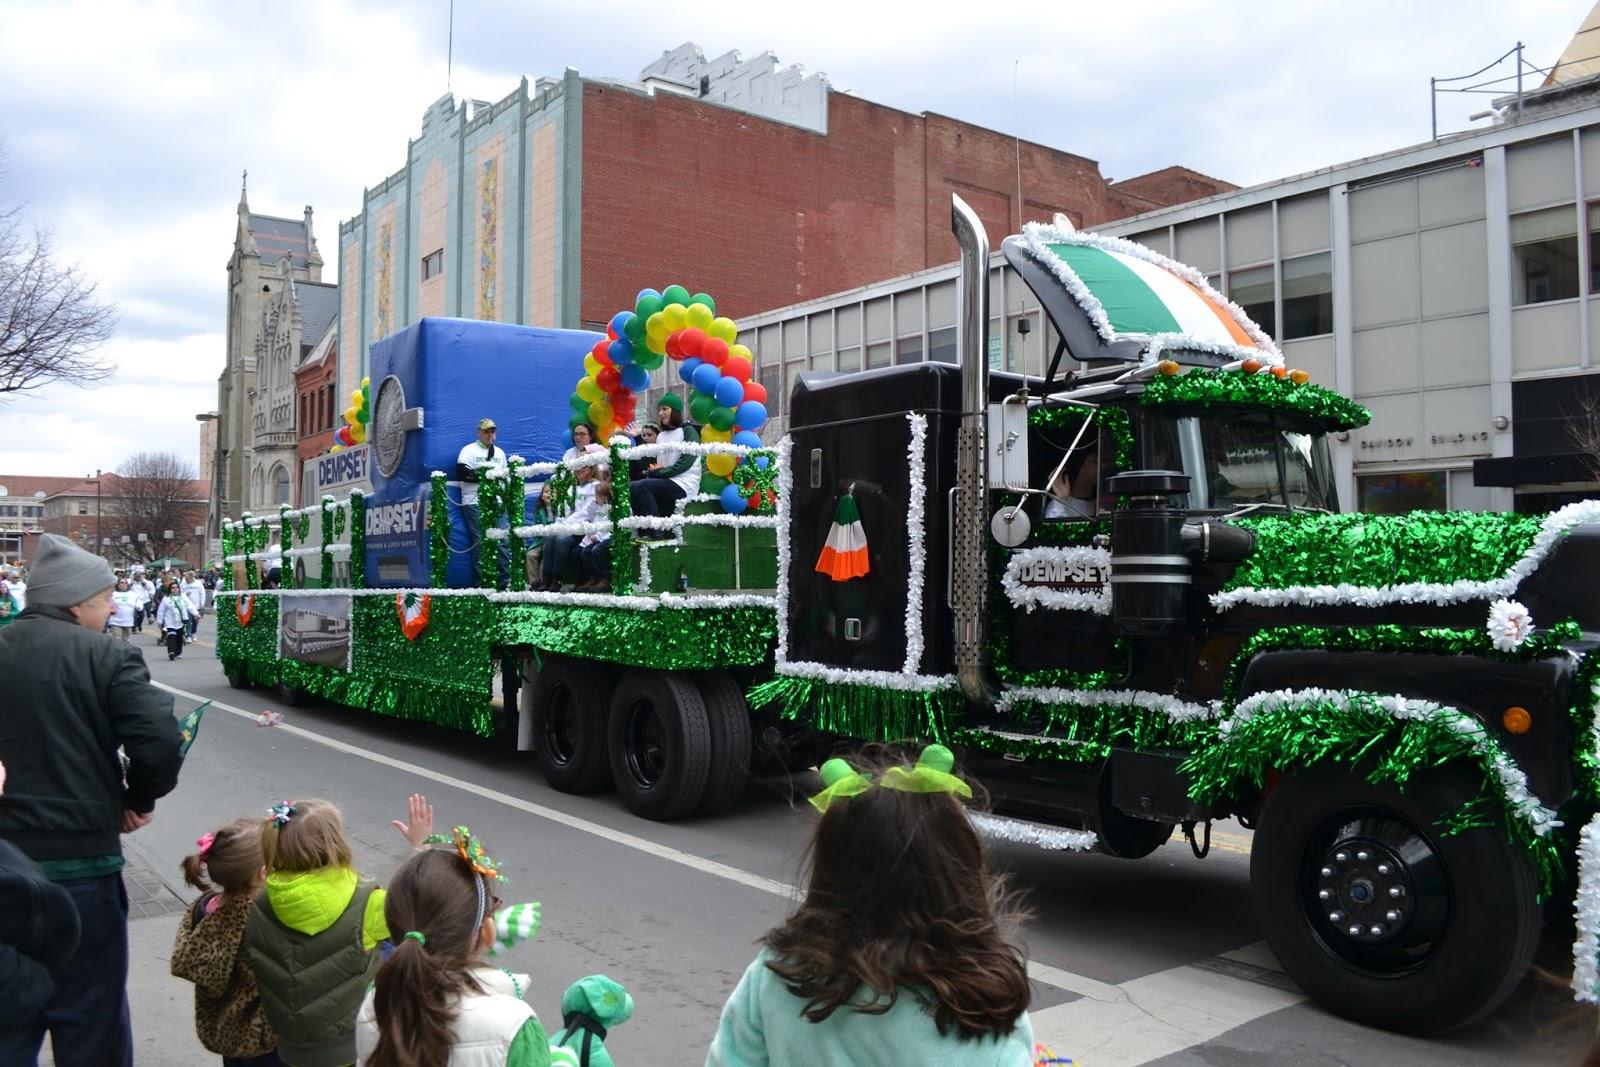 Парад ко дню Святого Патрика, Скрентон, Пенсильвания (St. Patrick's Day Parade, Scranton, PA)